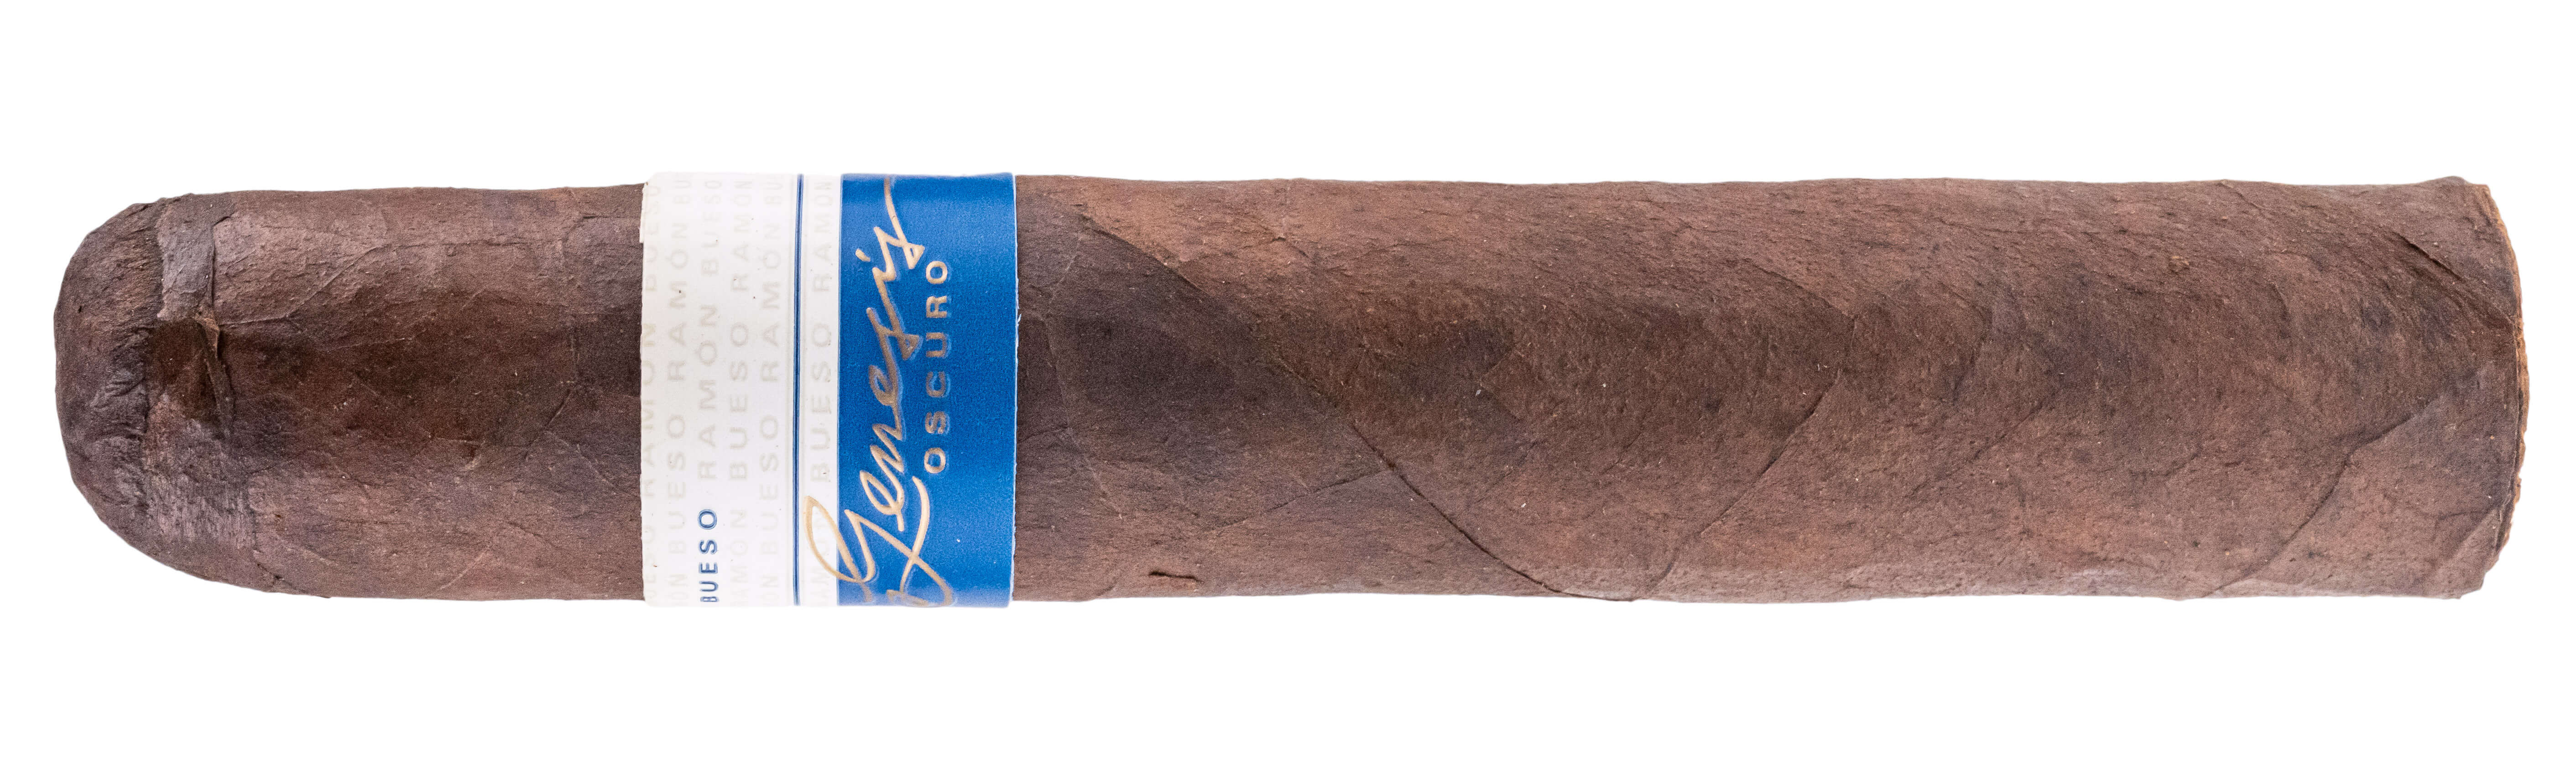 Blind Cigar Review: Ramon Bueso | Genesis Oscuro Robusto